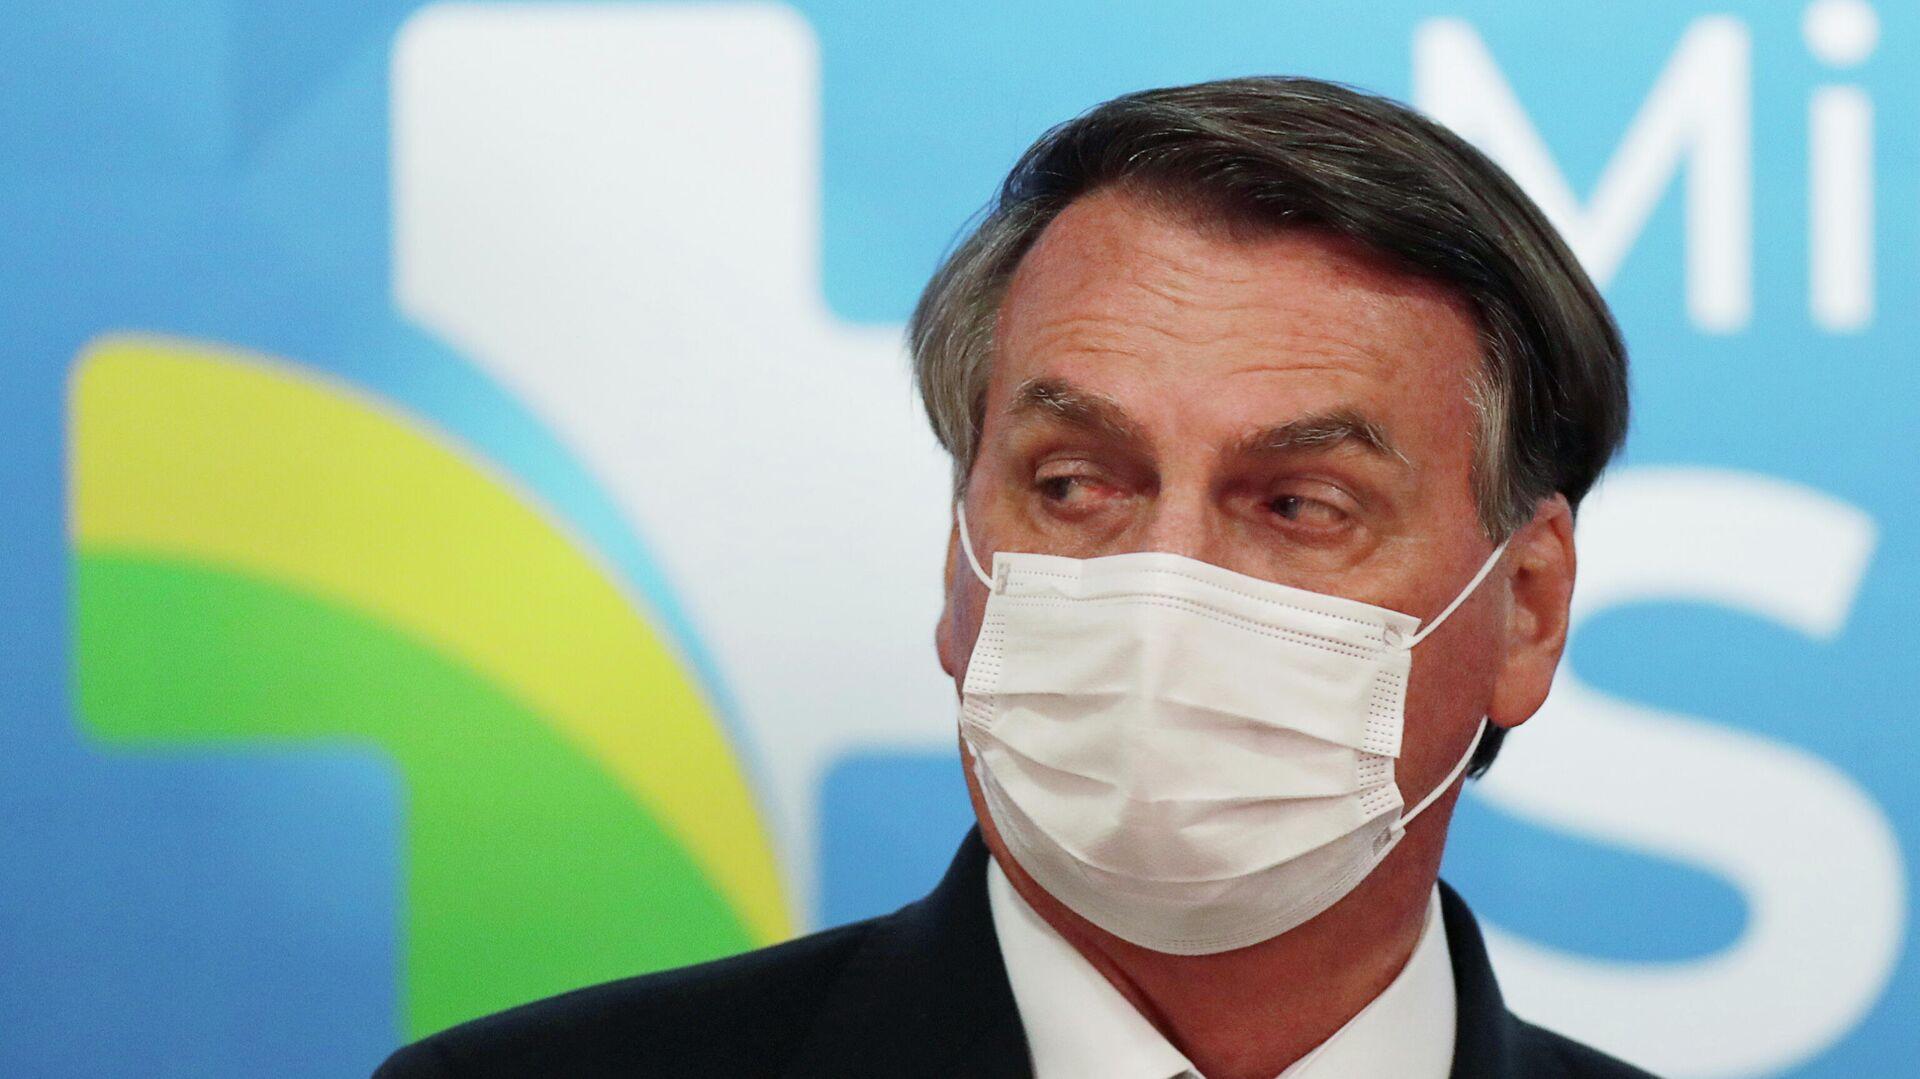 Jair Bolsonaro, presidente de Brasil - Sputnik Mundo, 1920, 03.06.2021